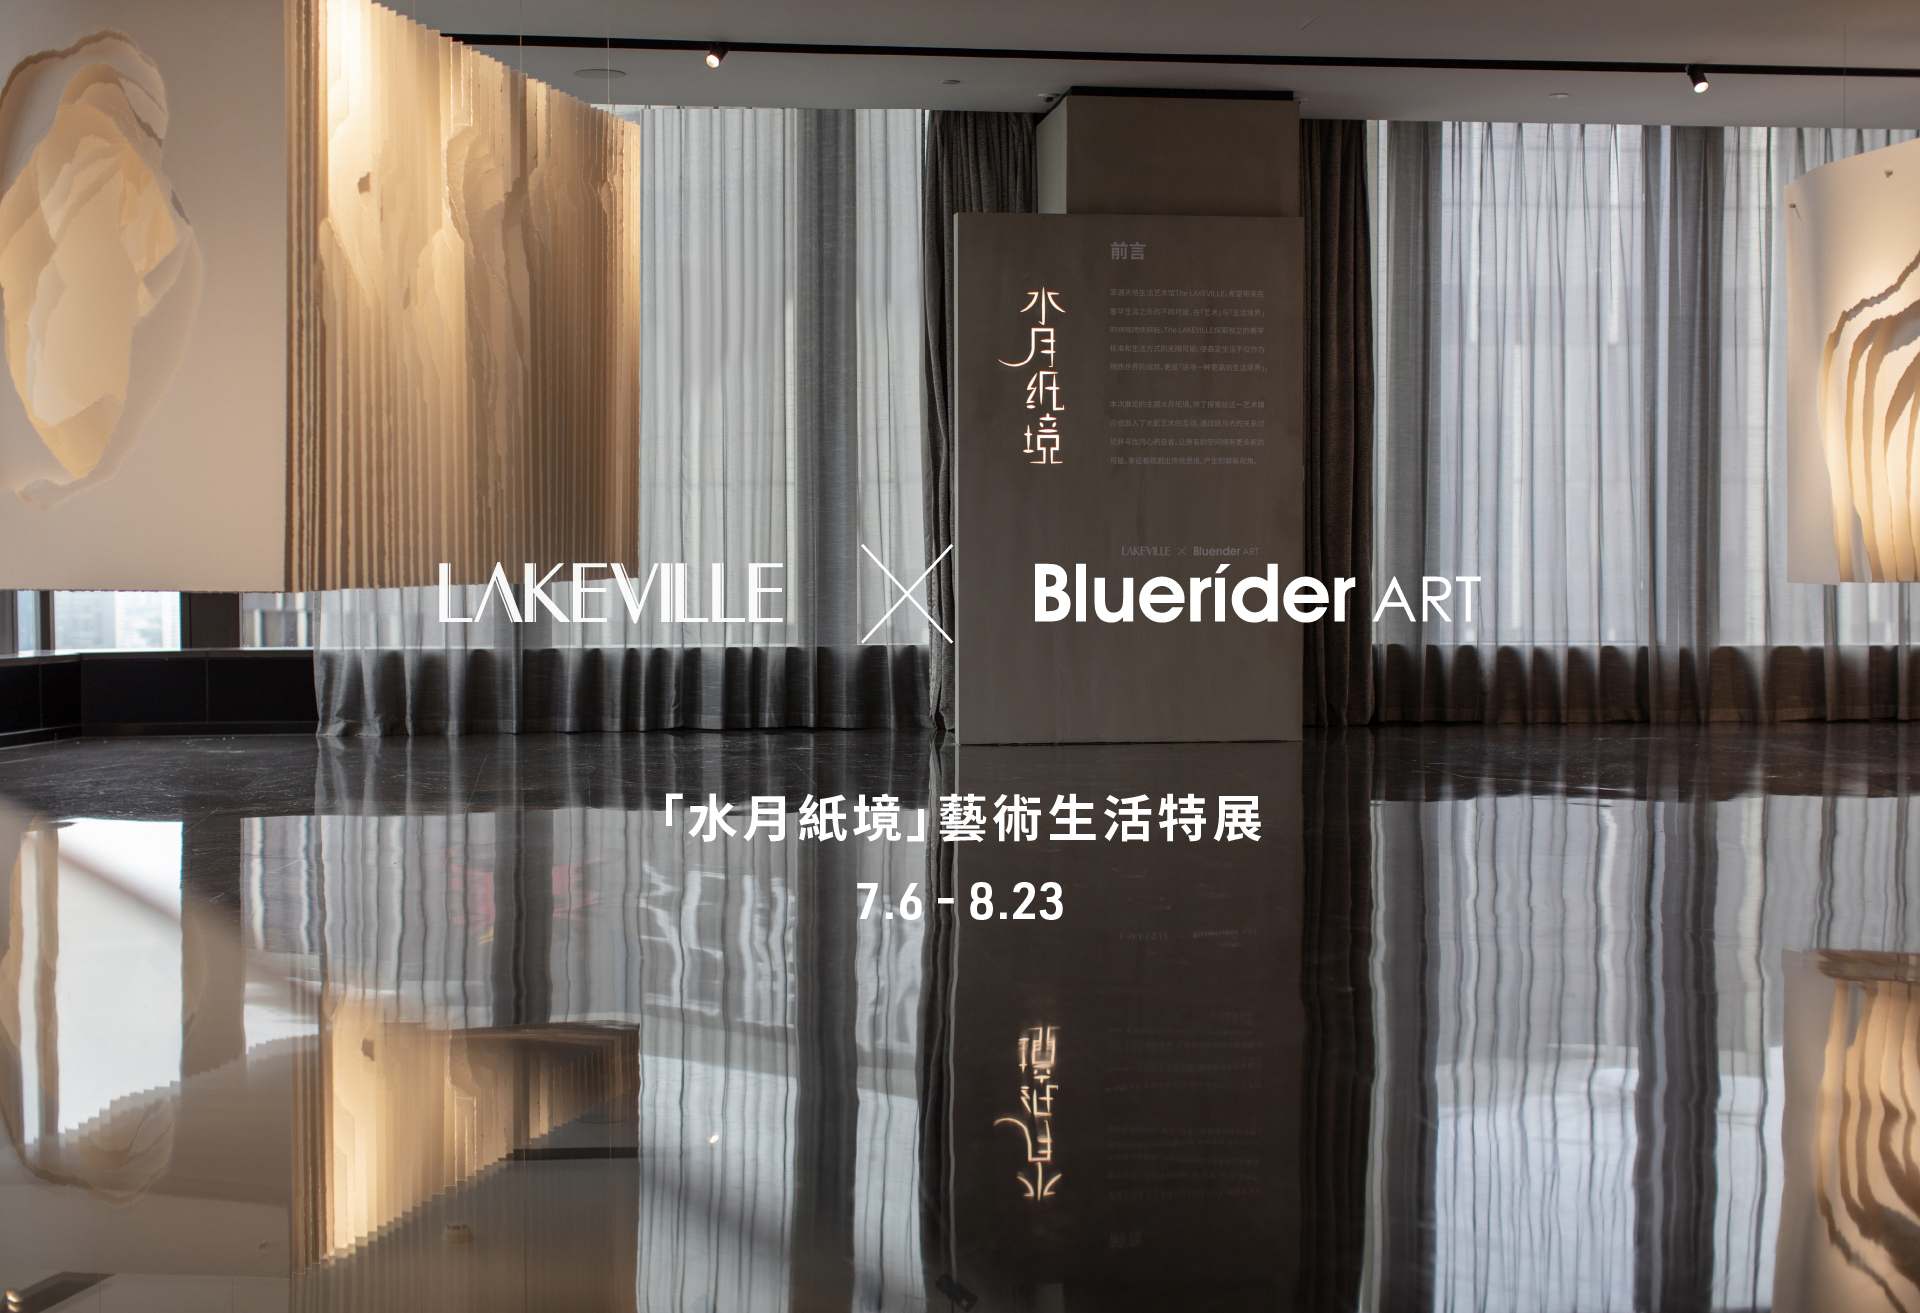 LAKEVILLE X Bluerider ART 水月紙境  藝術生活特展